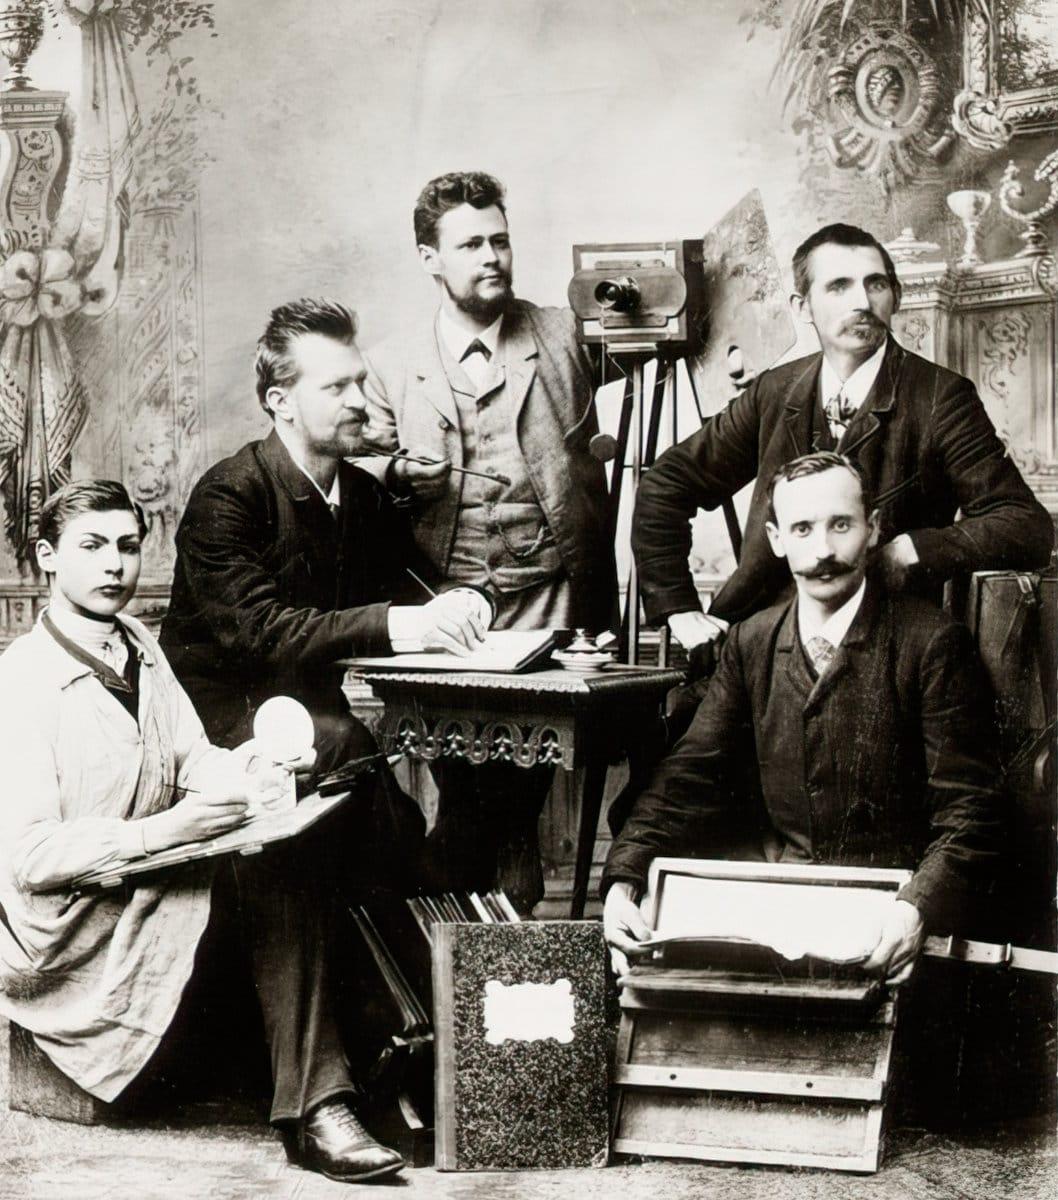 German photo studio team selfie - The Kodak Collection at the National Media Museum (1890) at ClickAmericana com